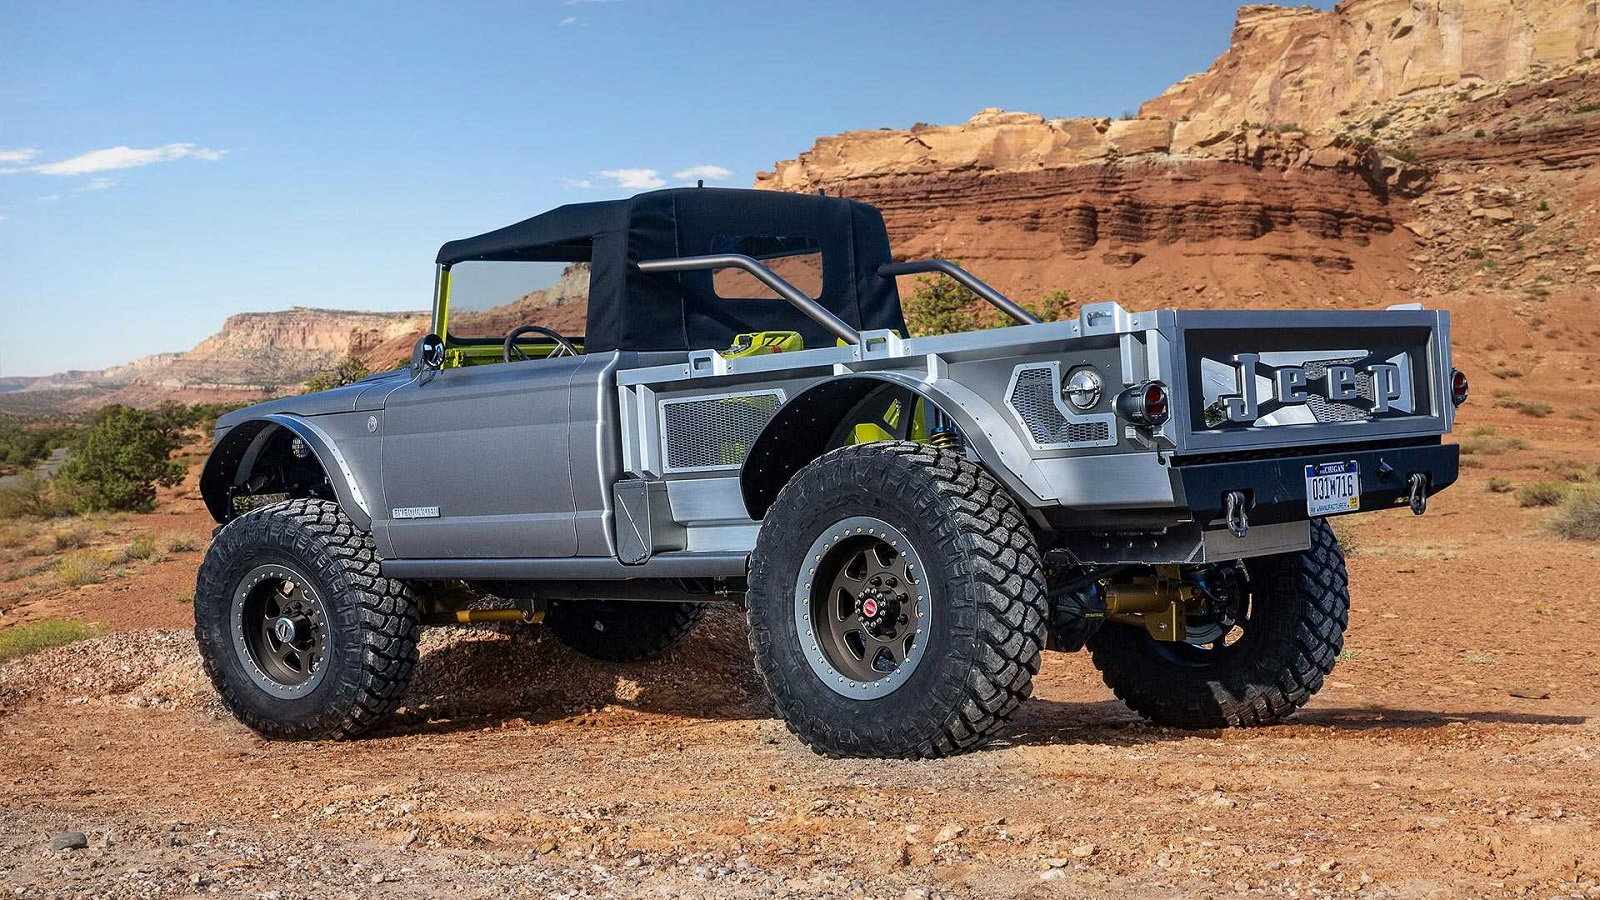 M-715 Five Quarter is a 700HP Convertible Beast